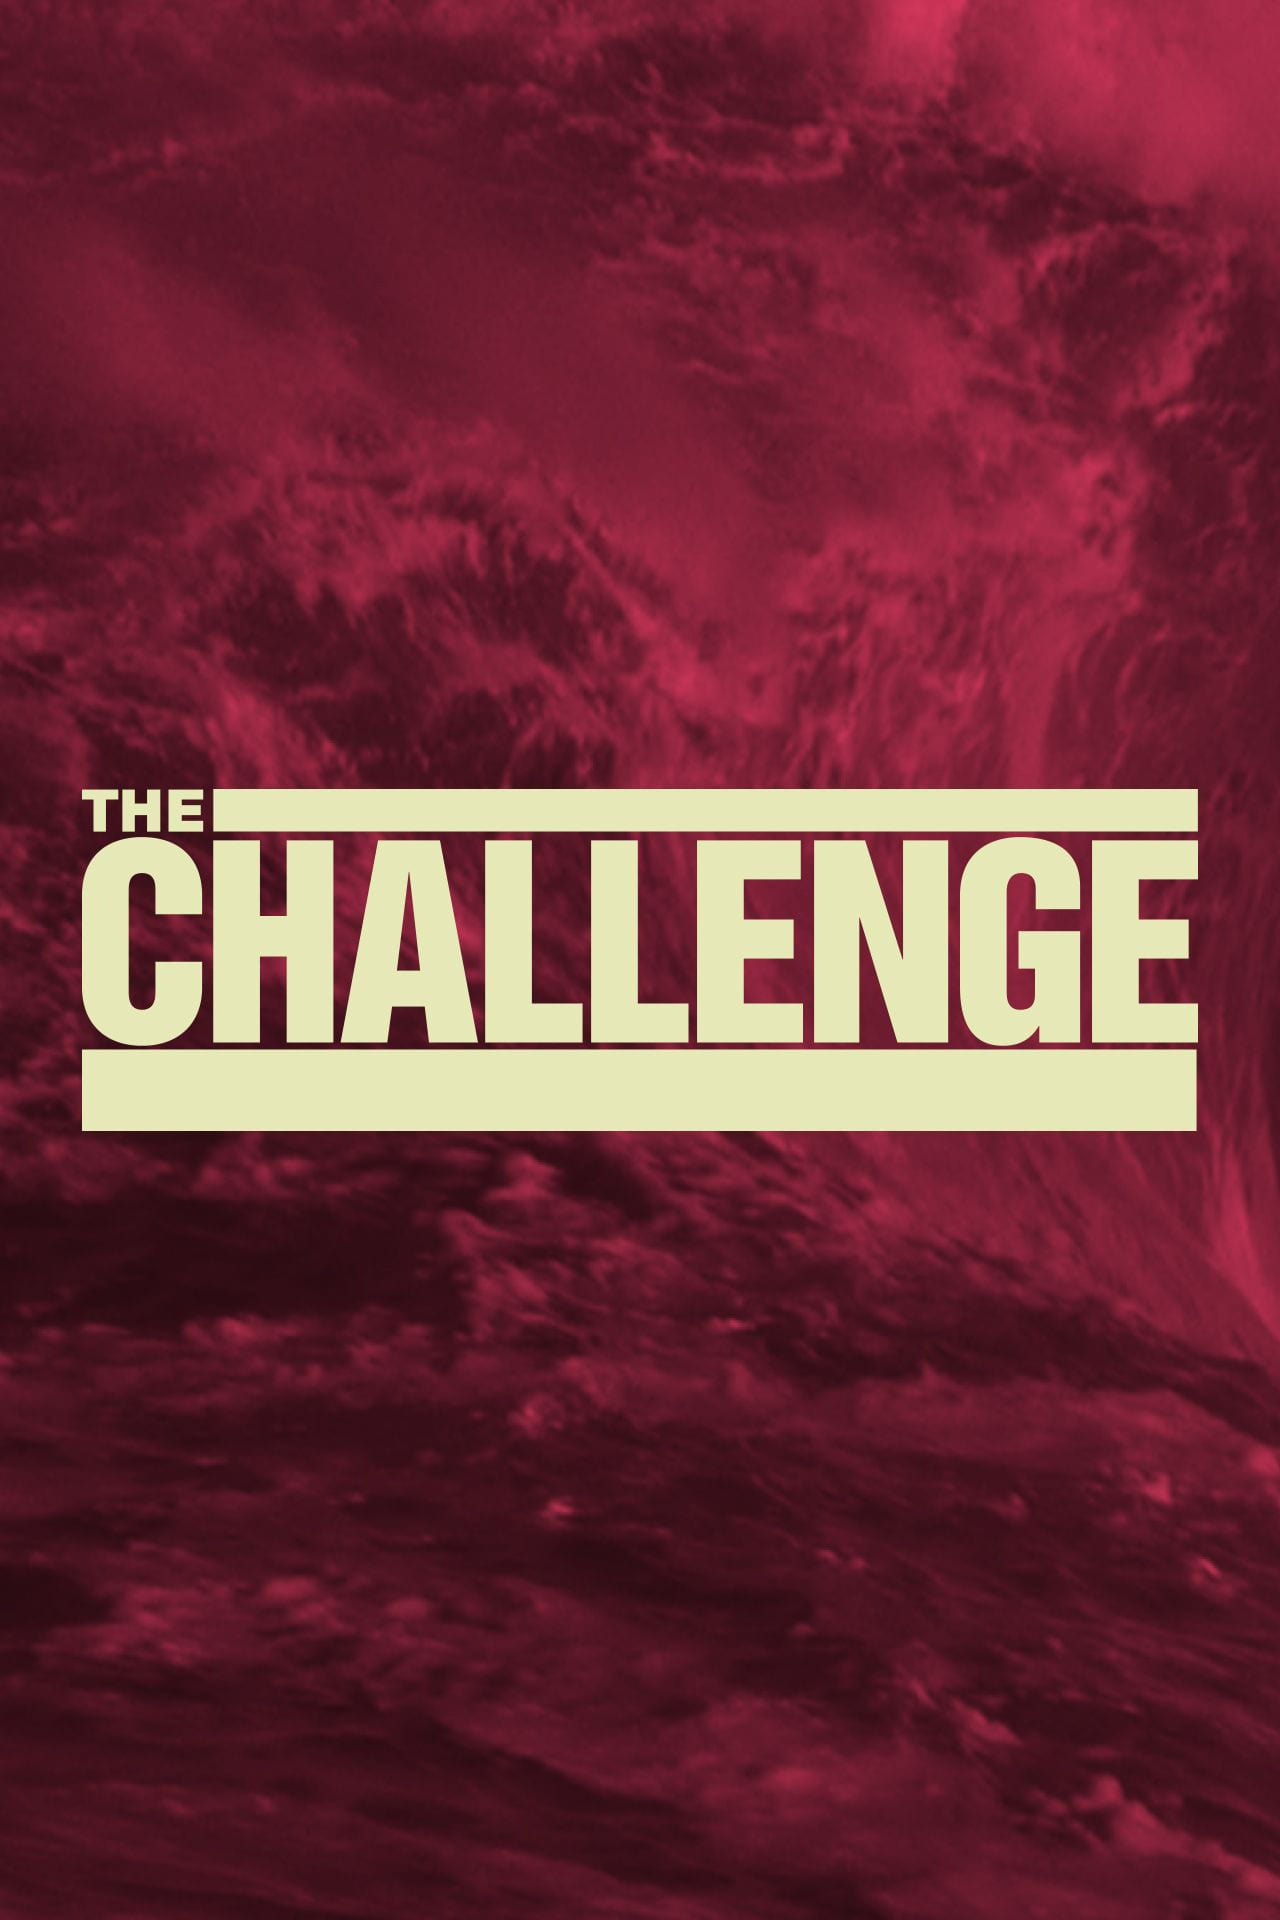 The Challenge teaser image